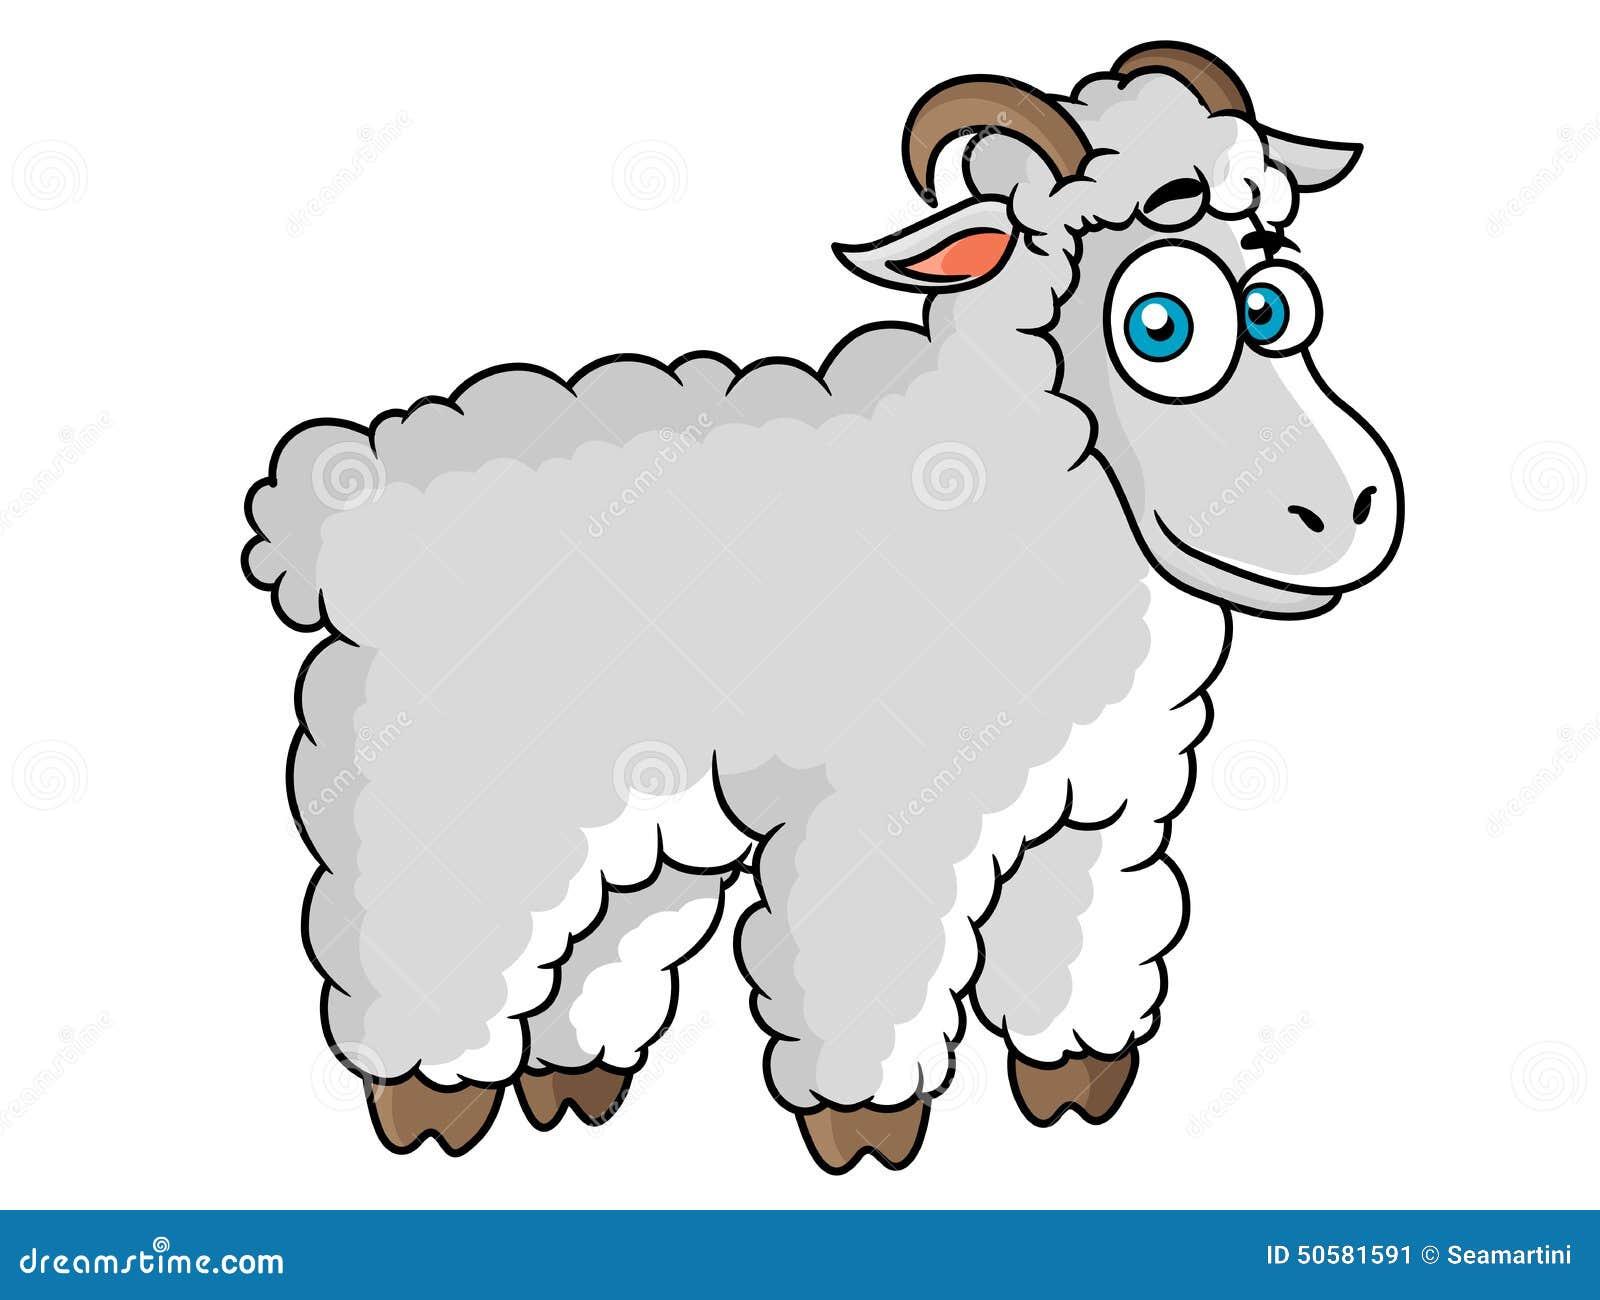 Cartoon Farm Sheep Character Stock Vector